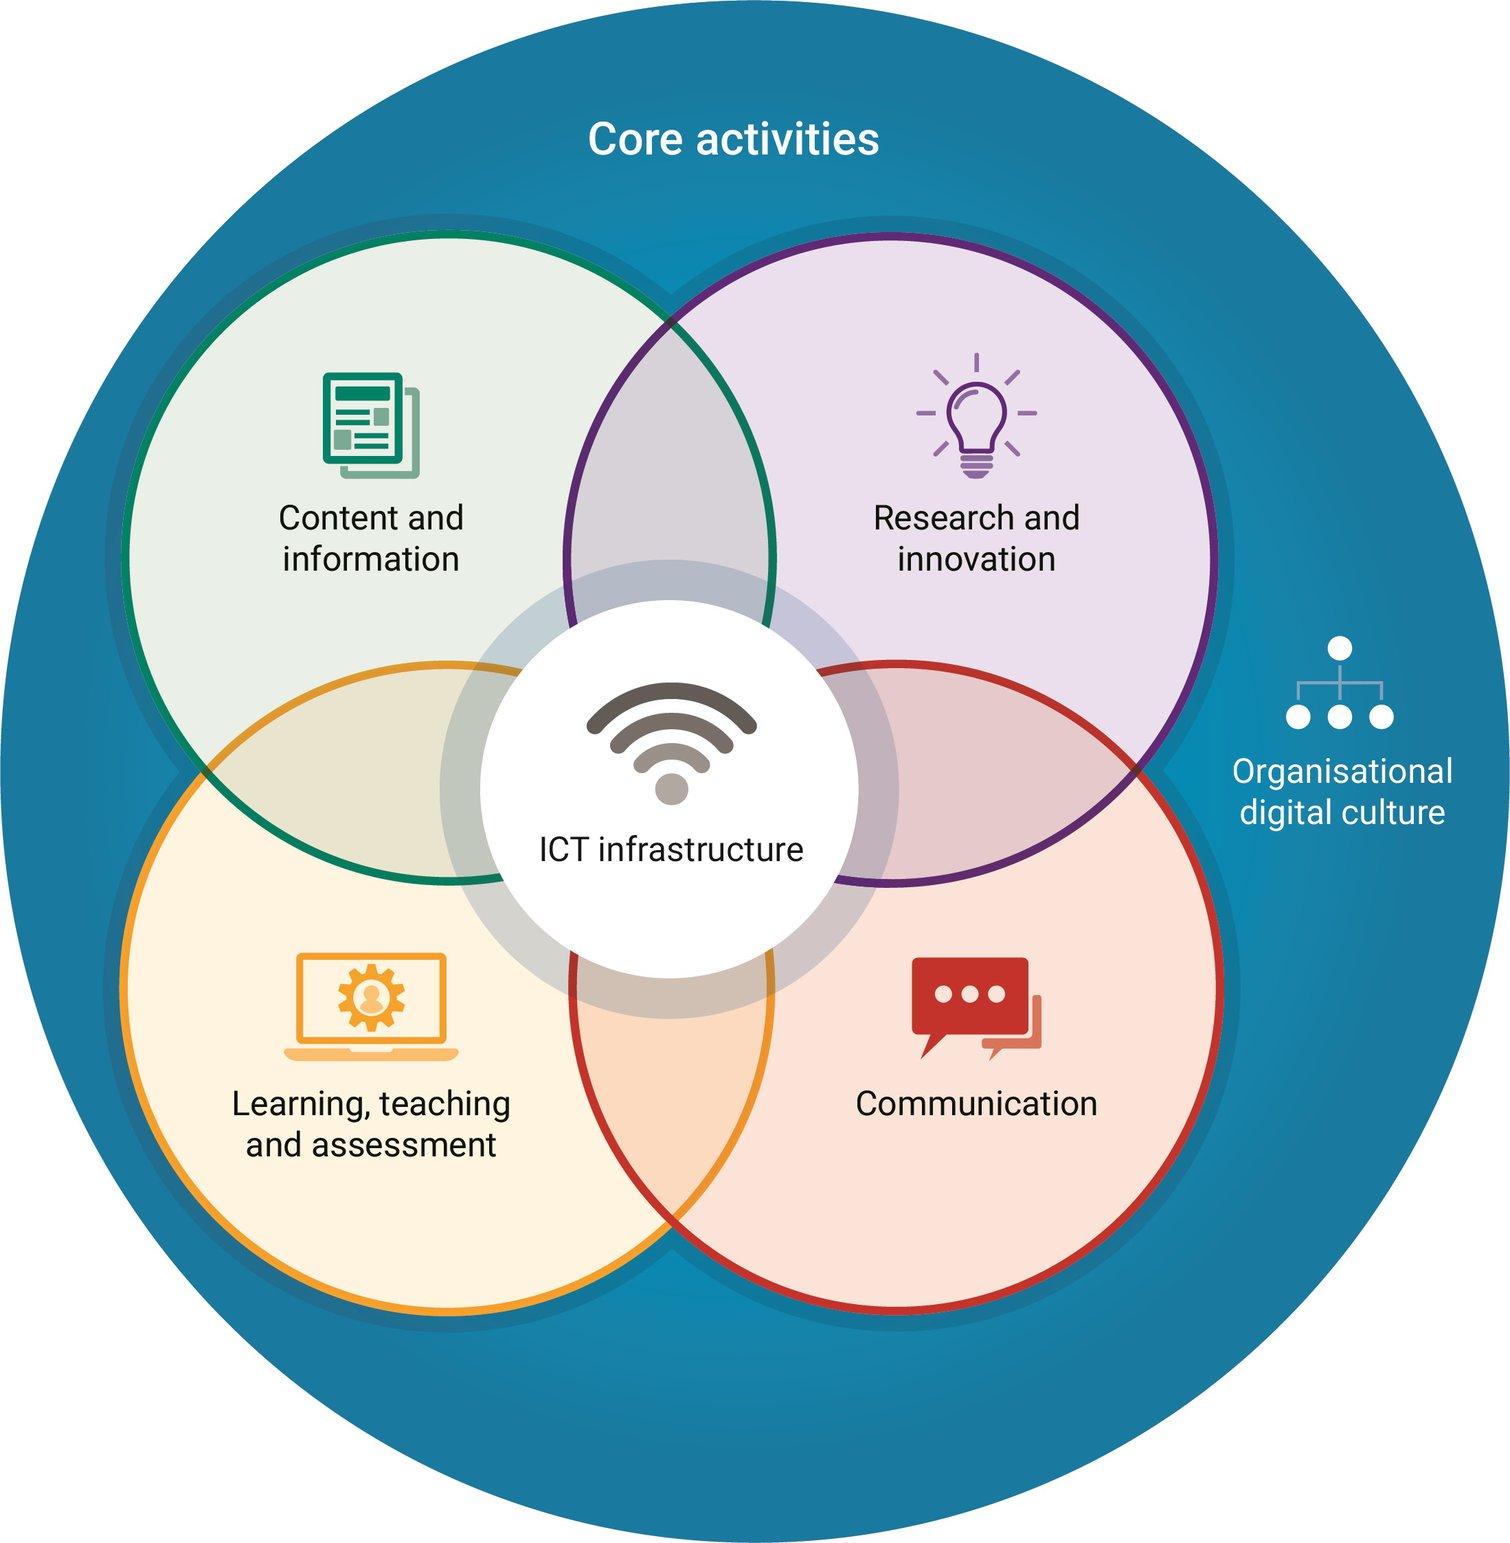 The digitally capable organisation